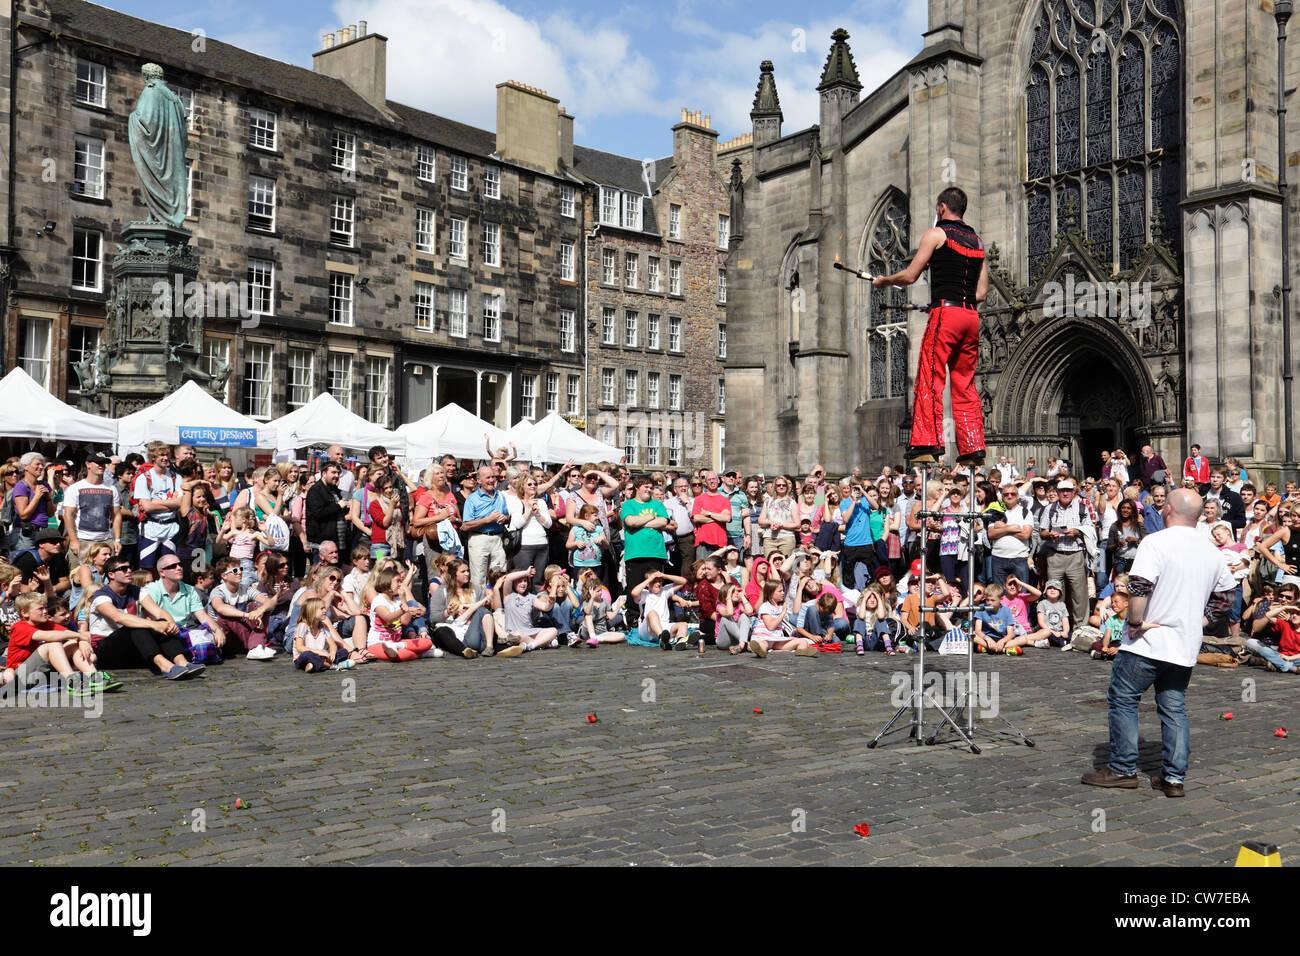 Spectators watching a street performance at the Edinburgh Festival Fringe in Scotland, UK - Stock Image